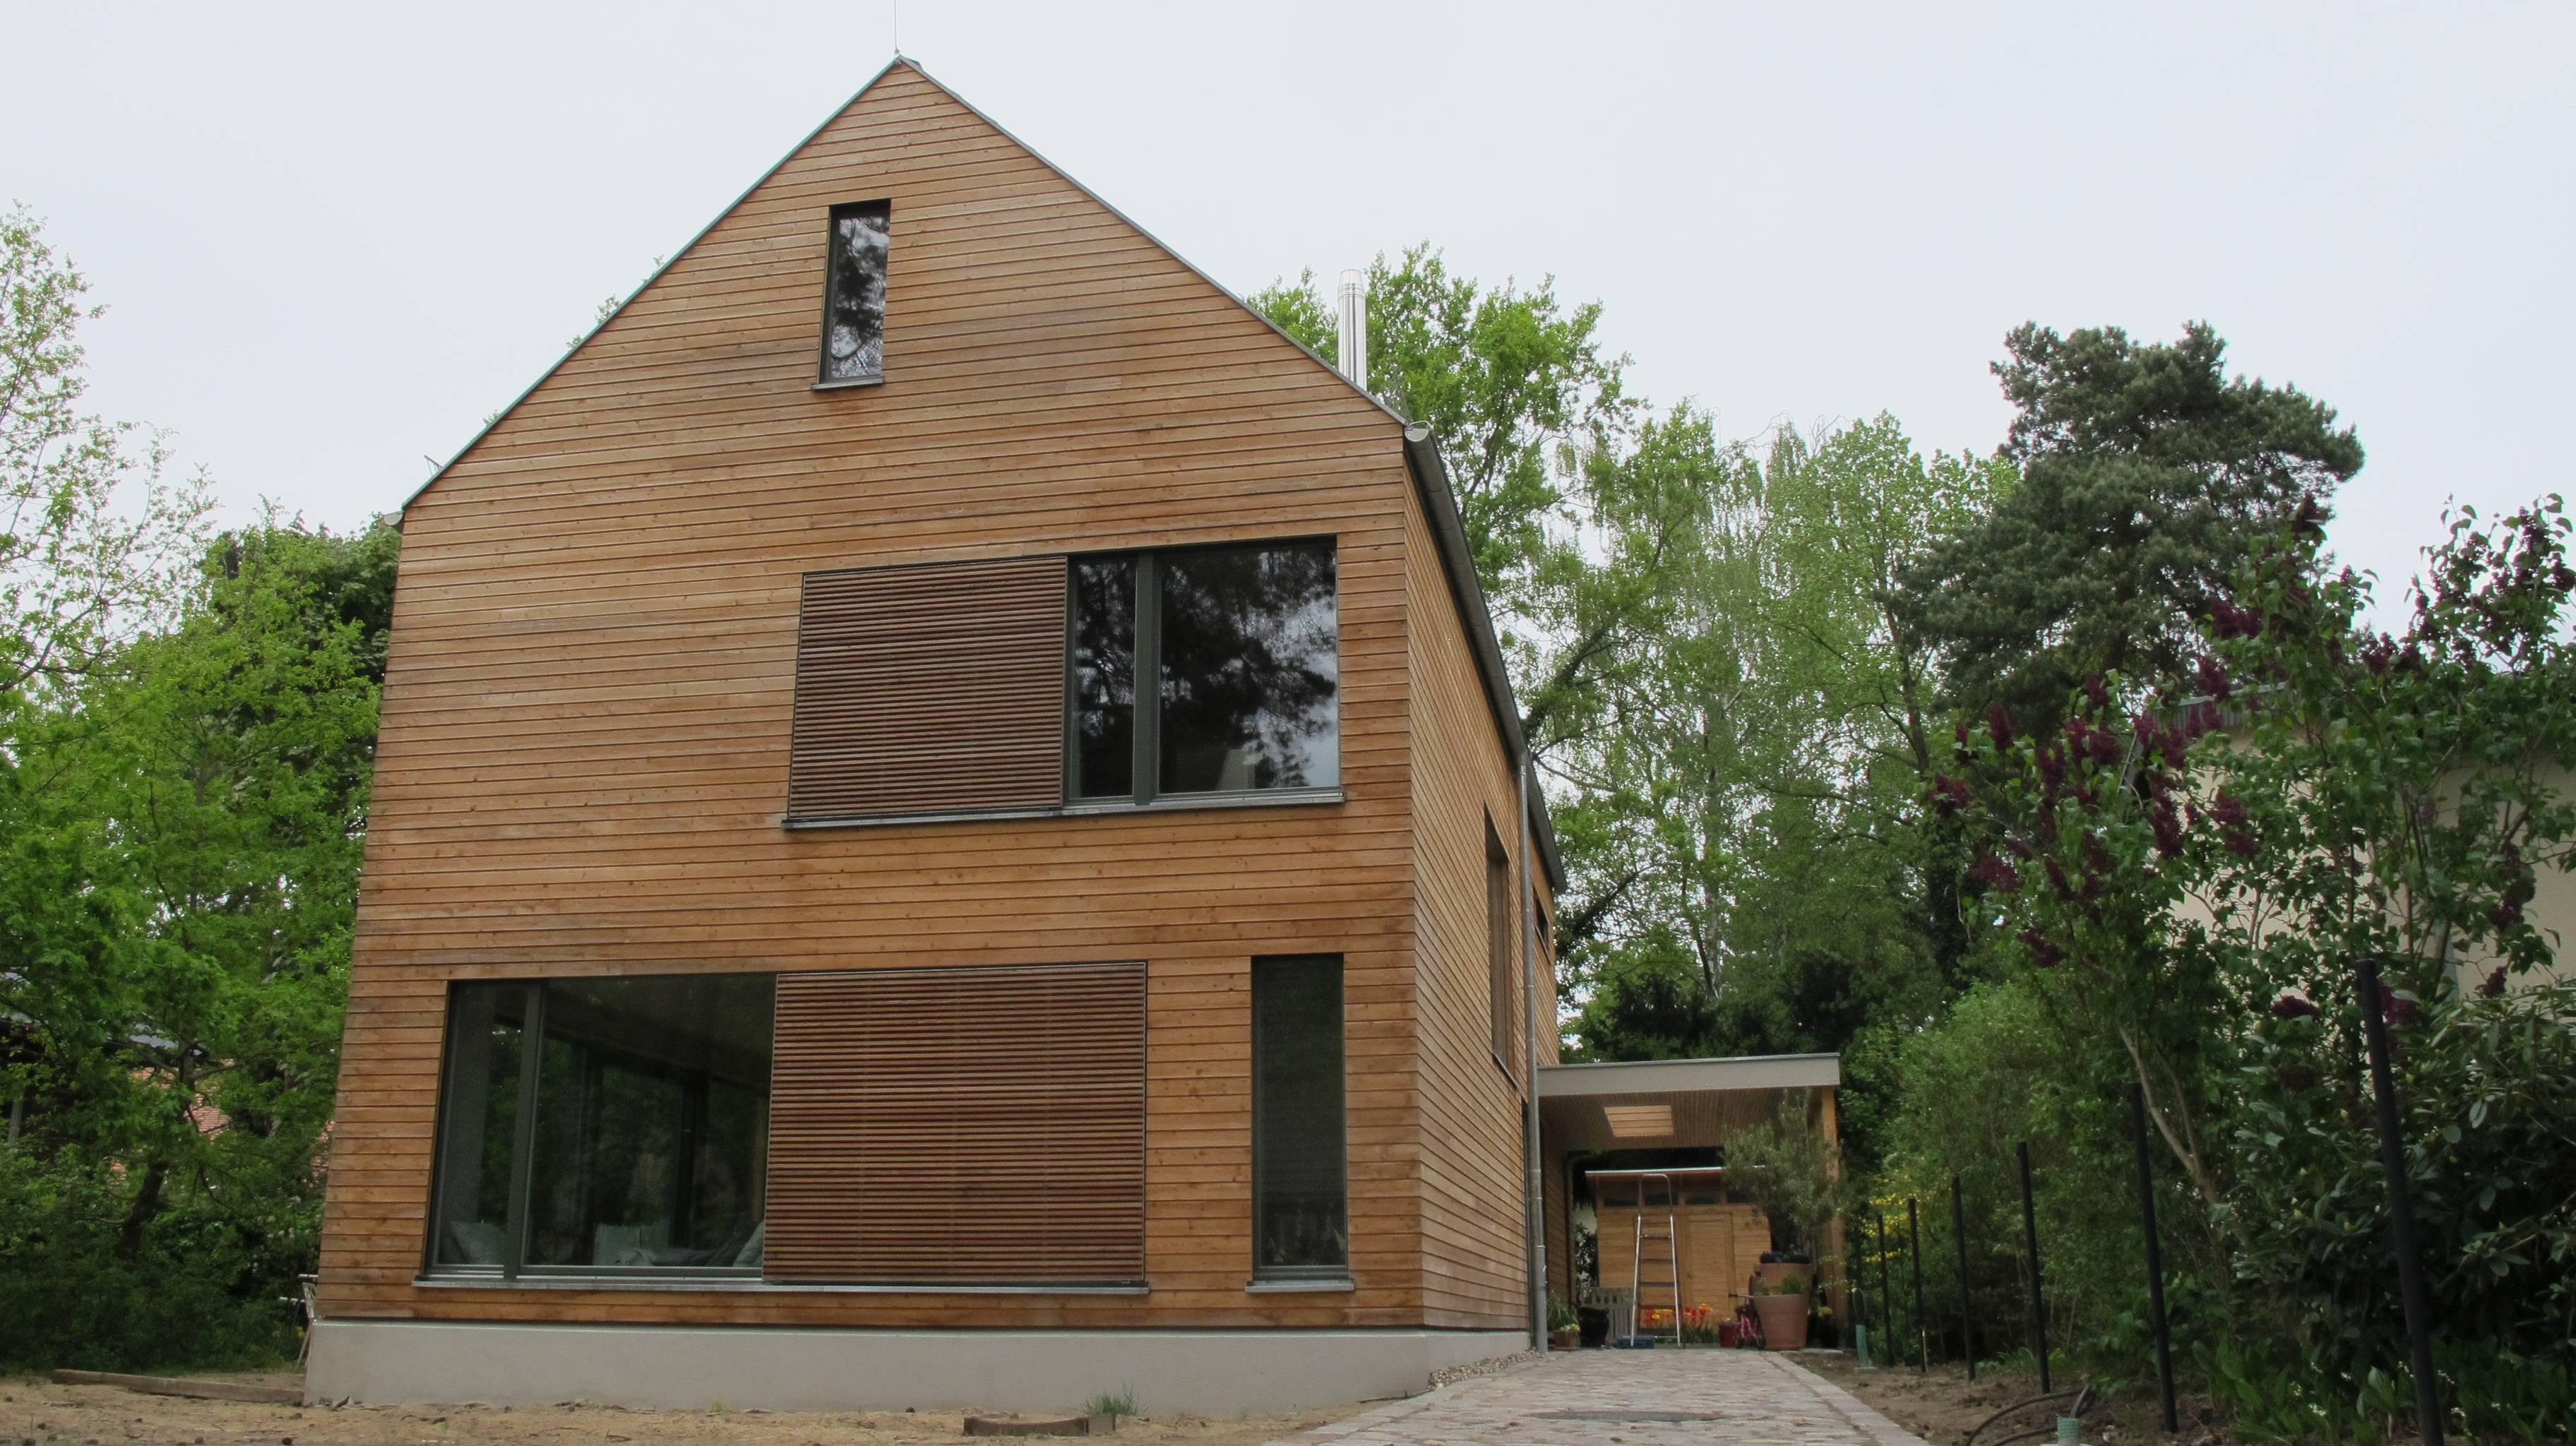 Holzrahmenbau_Holzfenster_Warmfenster_Fecon_Nordwest